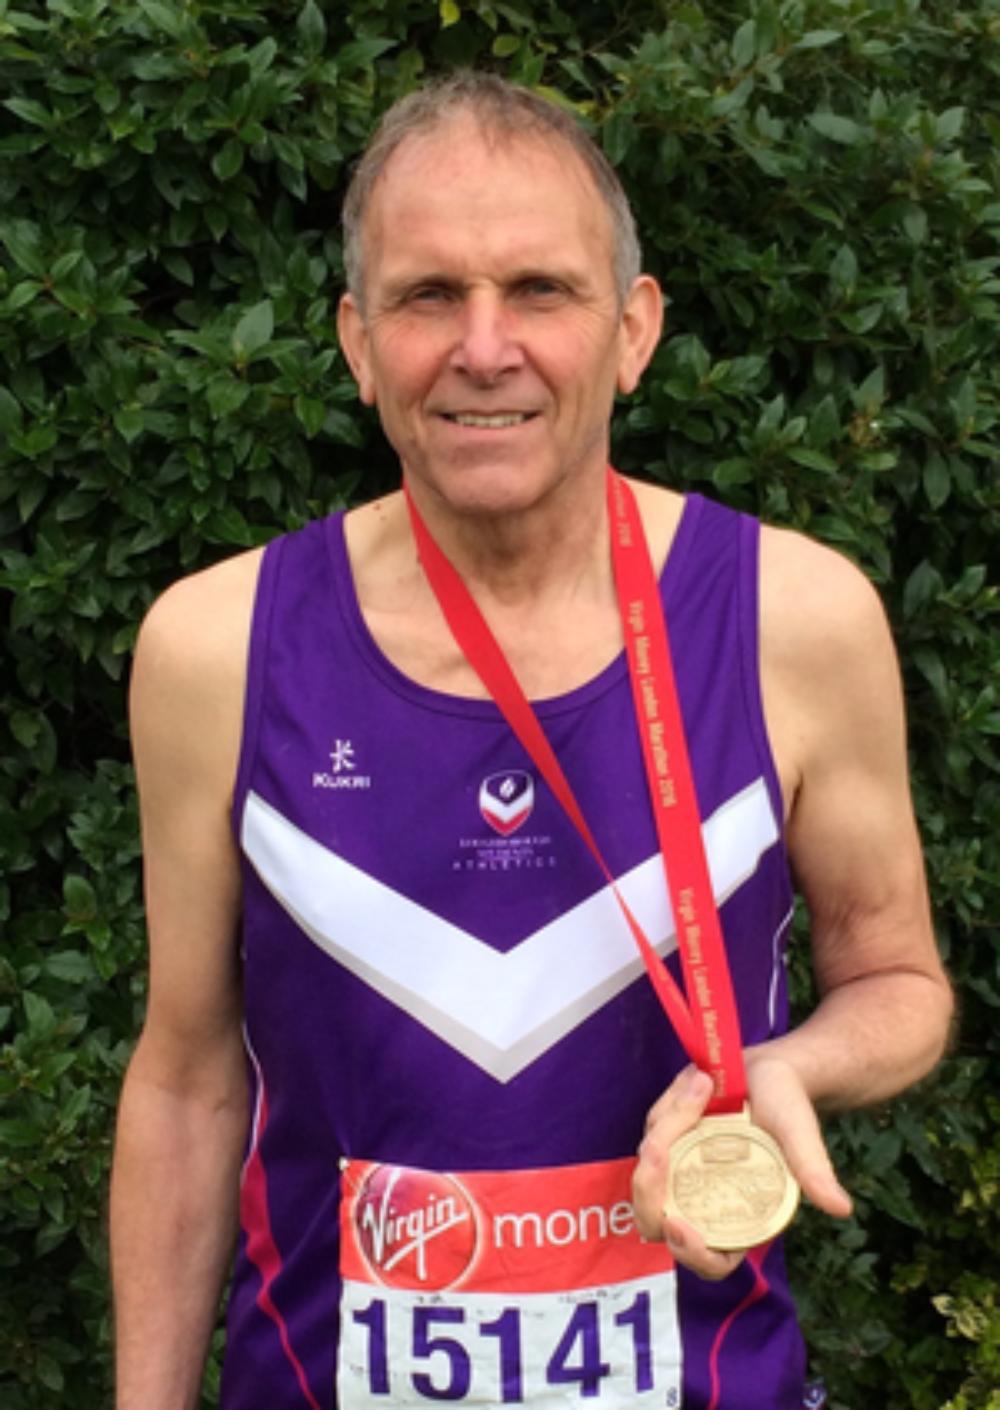 alan_london_marathon_medal1